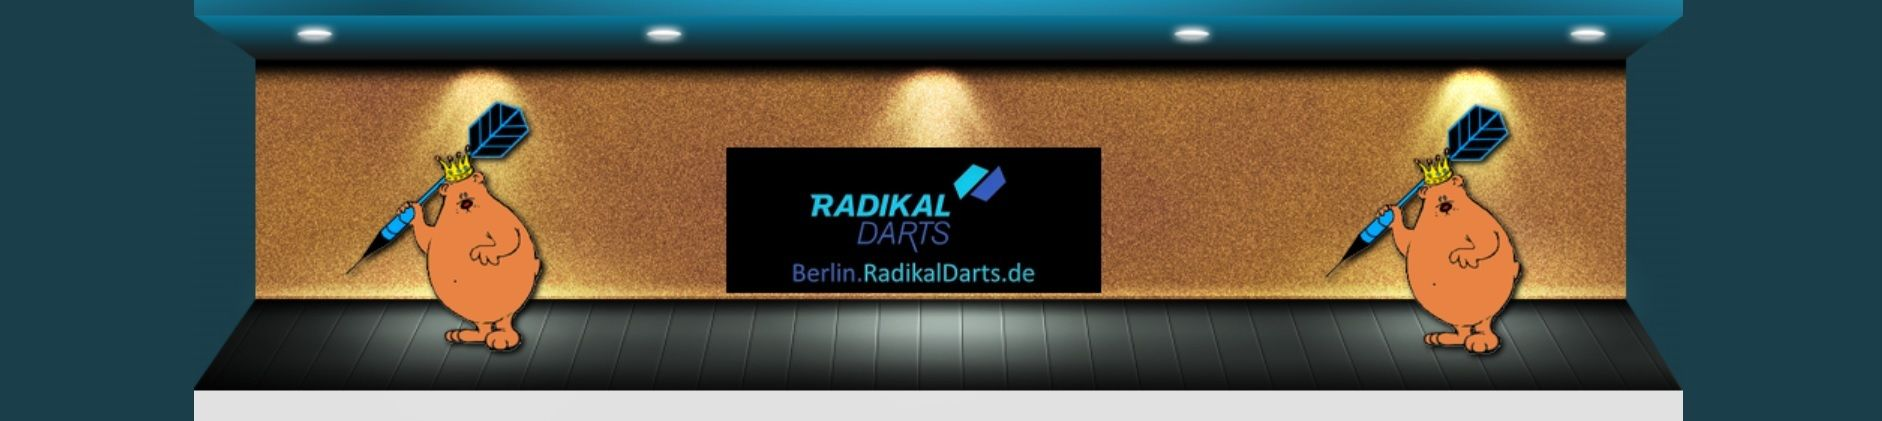 Impressum | Radikaldarts-Berlin.de